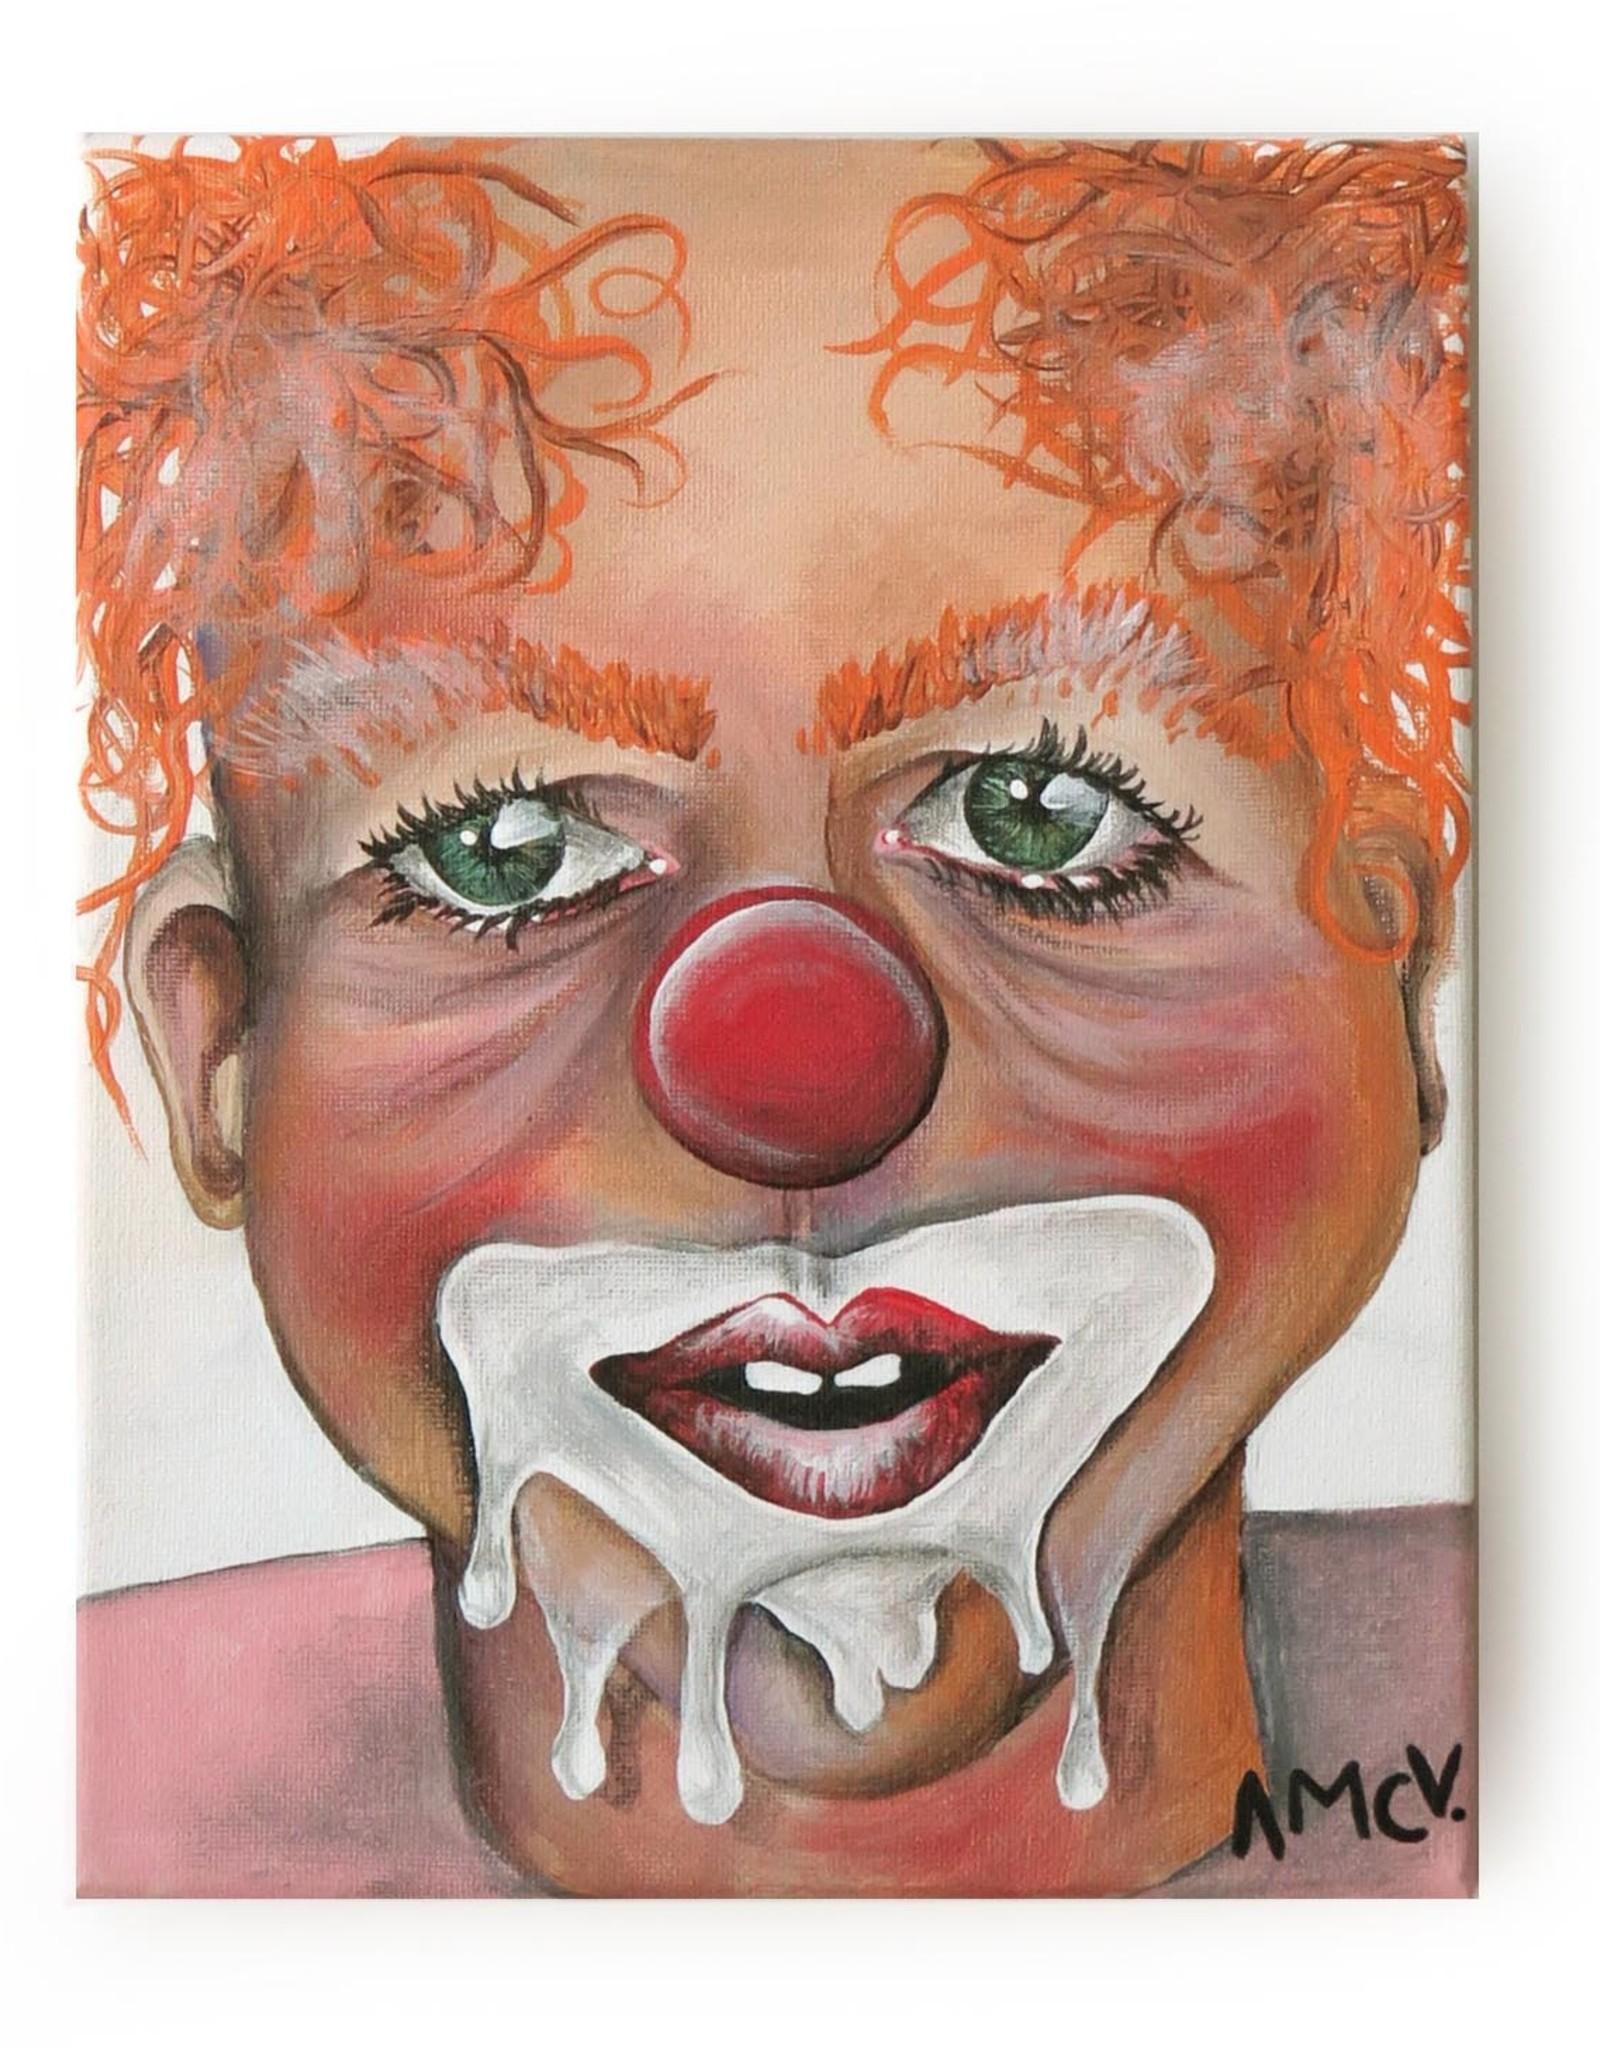 "AMCV ""Self-Portrait"" 3 acrylic on canvas by AMCV"